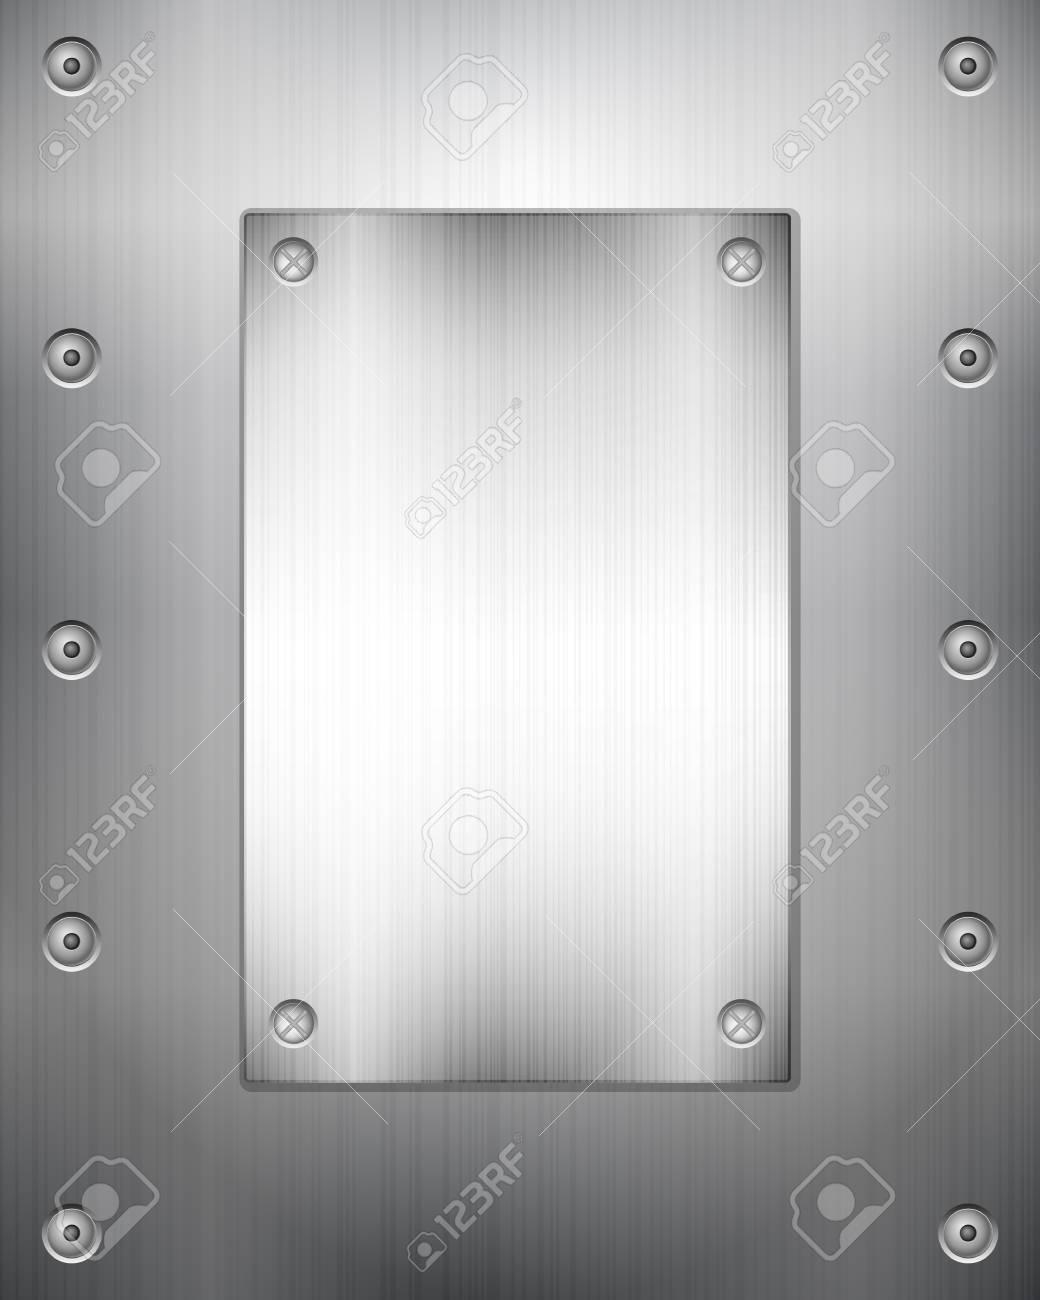 Pattern of metal texture background. Vector illustration. Stock Vector - 22402449